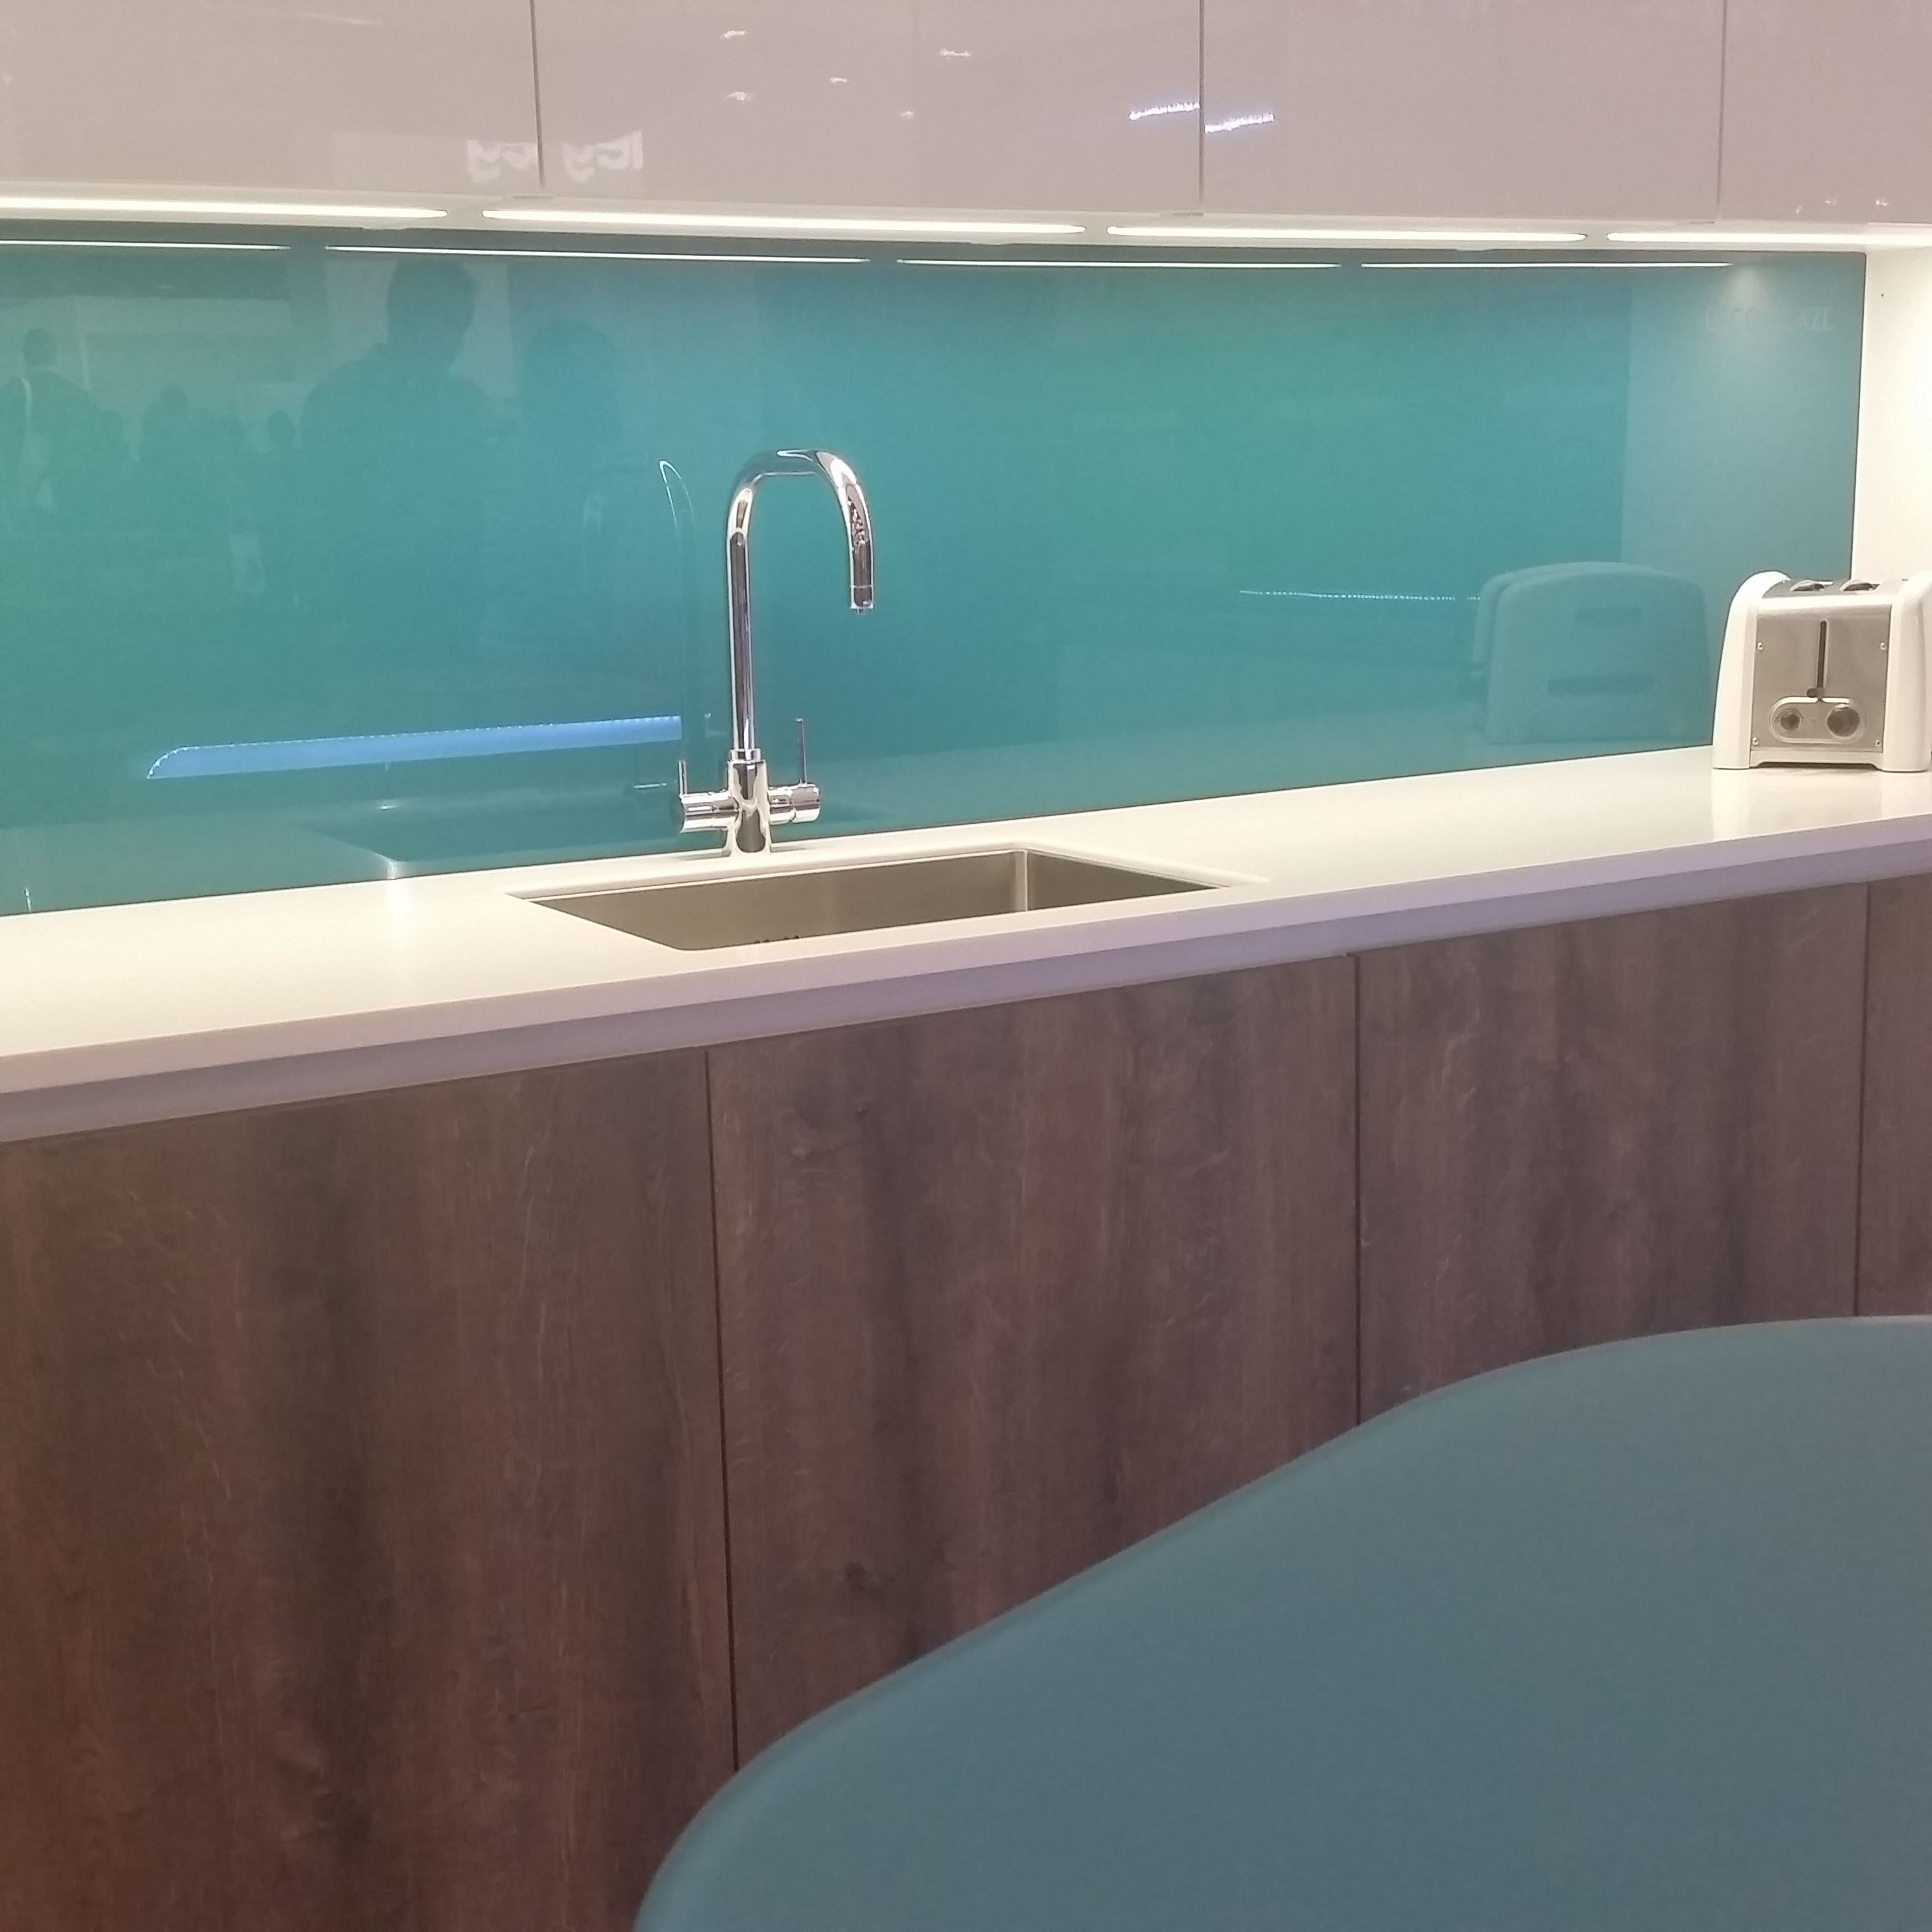 Kitchen Tiles Glass Splashback aqua marine turquoise glass metro tiles | kitchen subway tiles